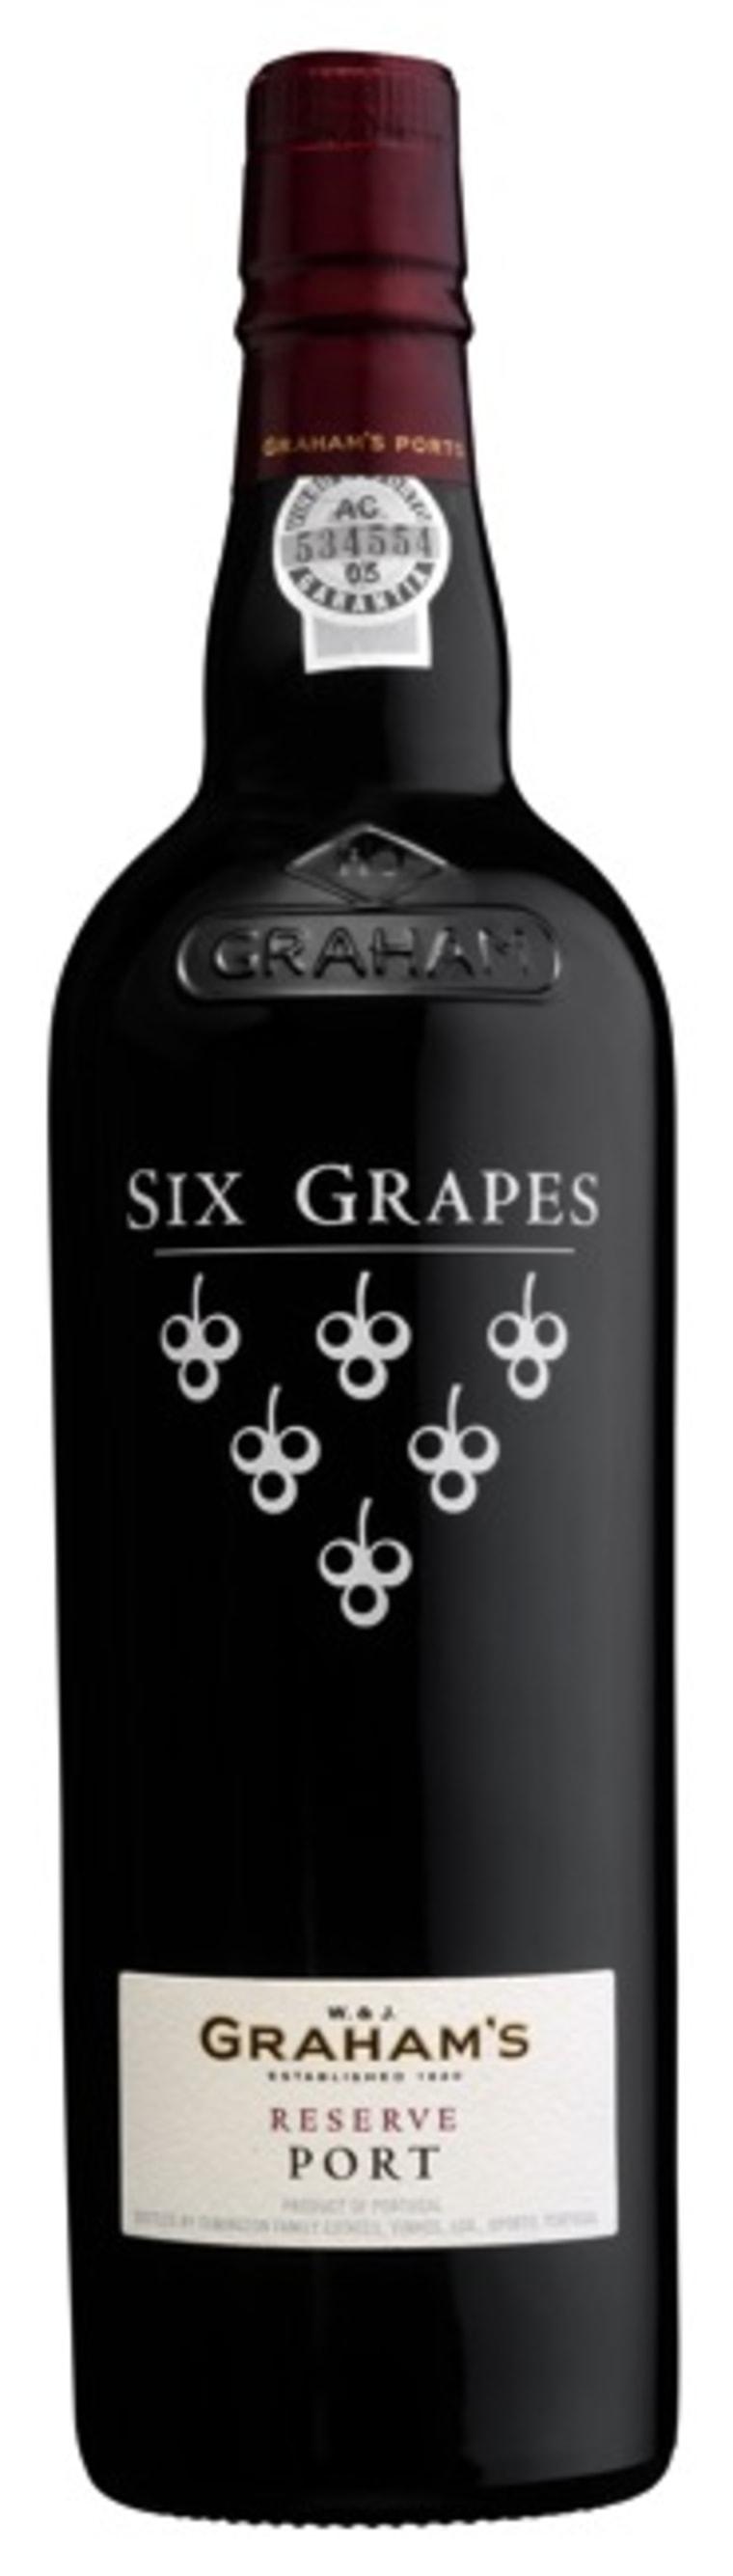 "Graham's ""Six Grapes"" Reserve Port"